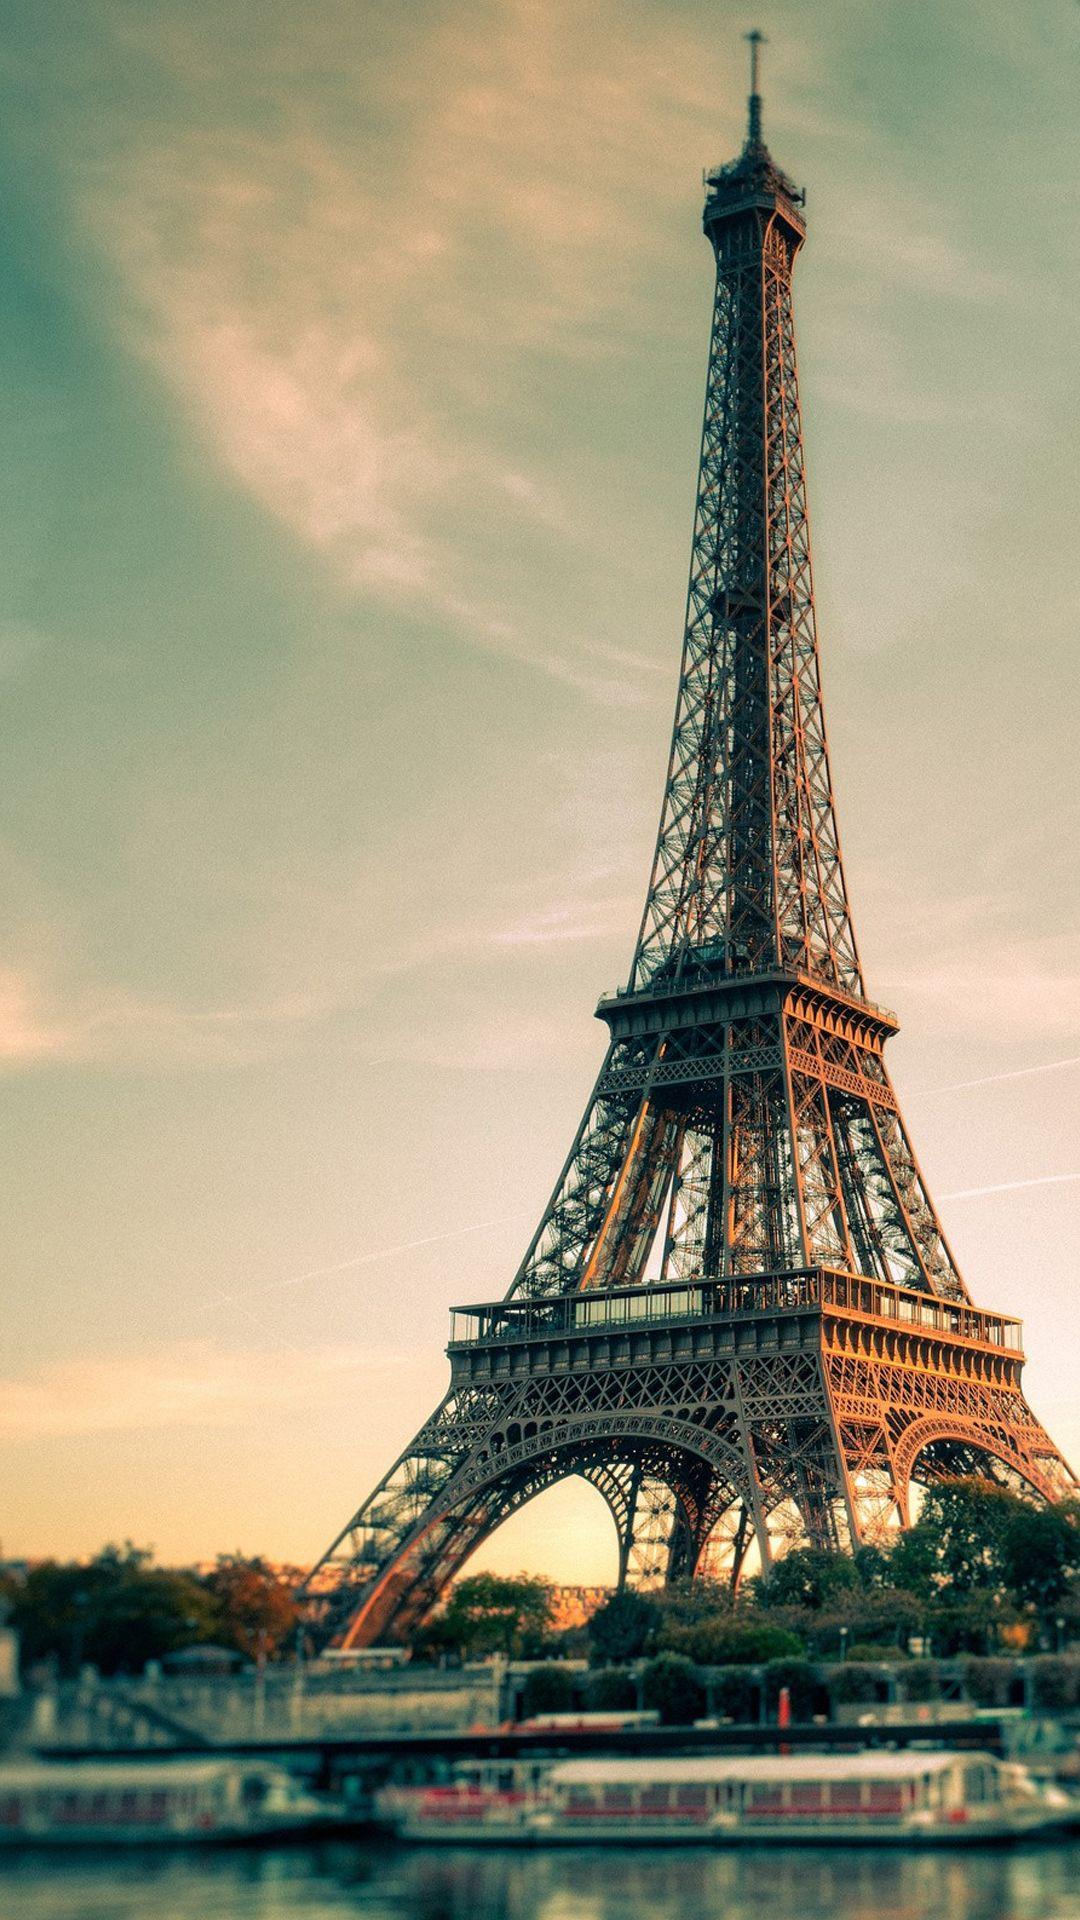 Paris Eiffel Tower Smartphone HD Wallpapers Fotografia